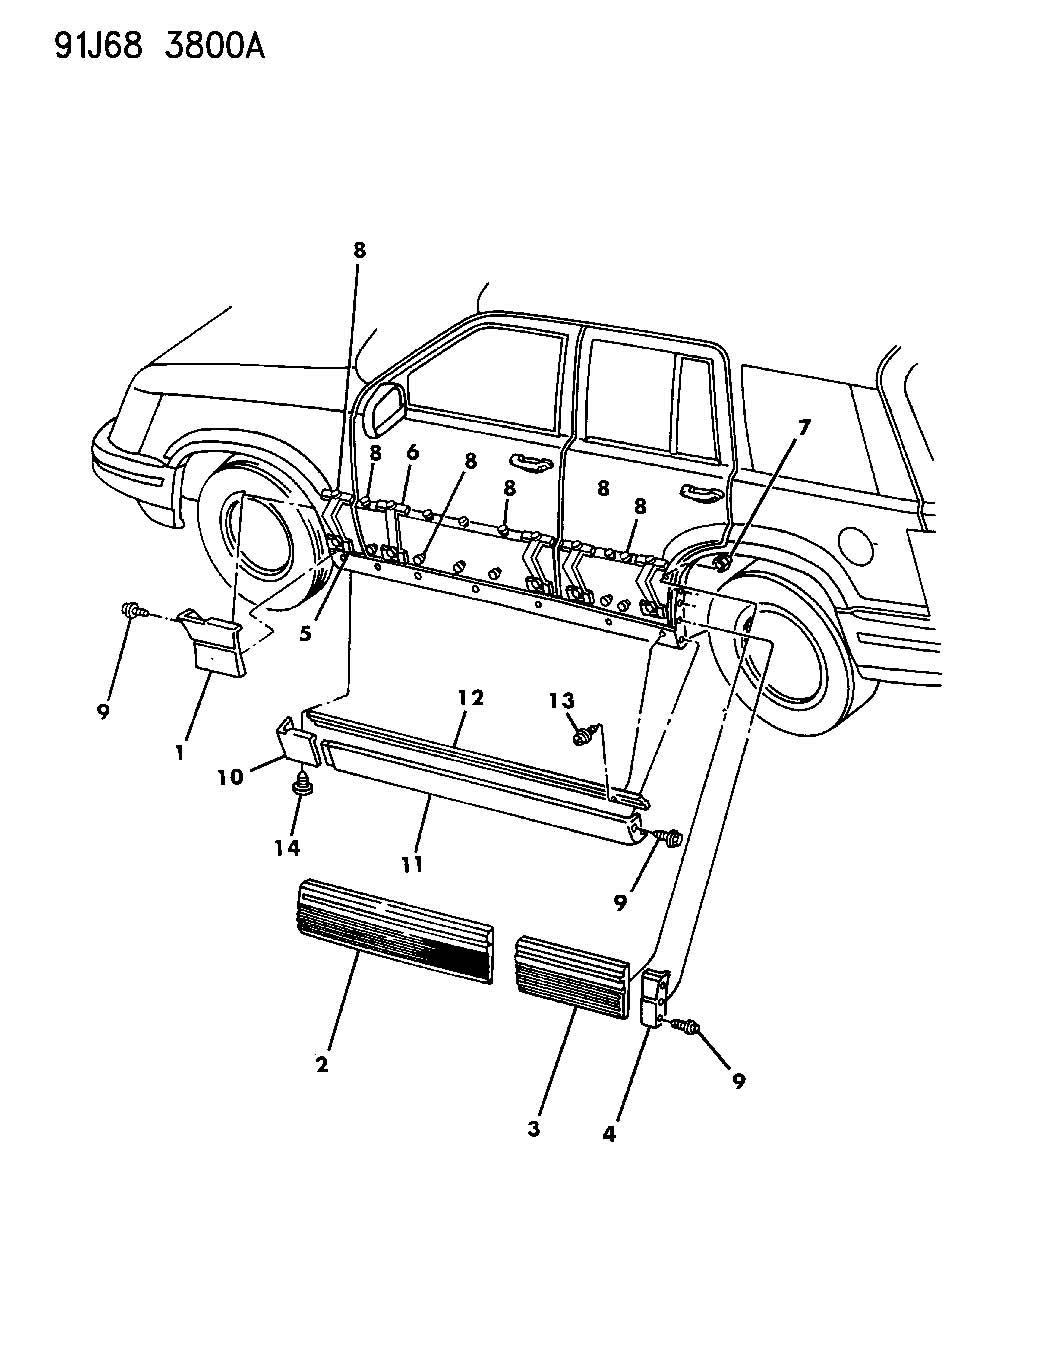 jeep grand cherokee molding  side sill  right  color   no description available  exterior